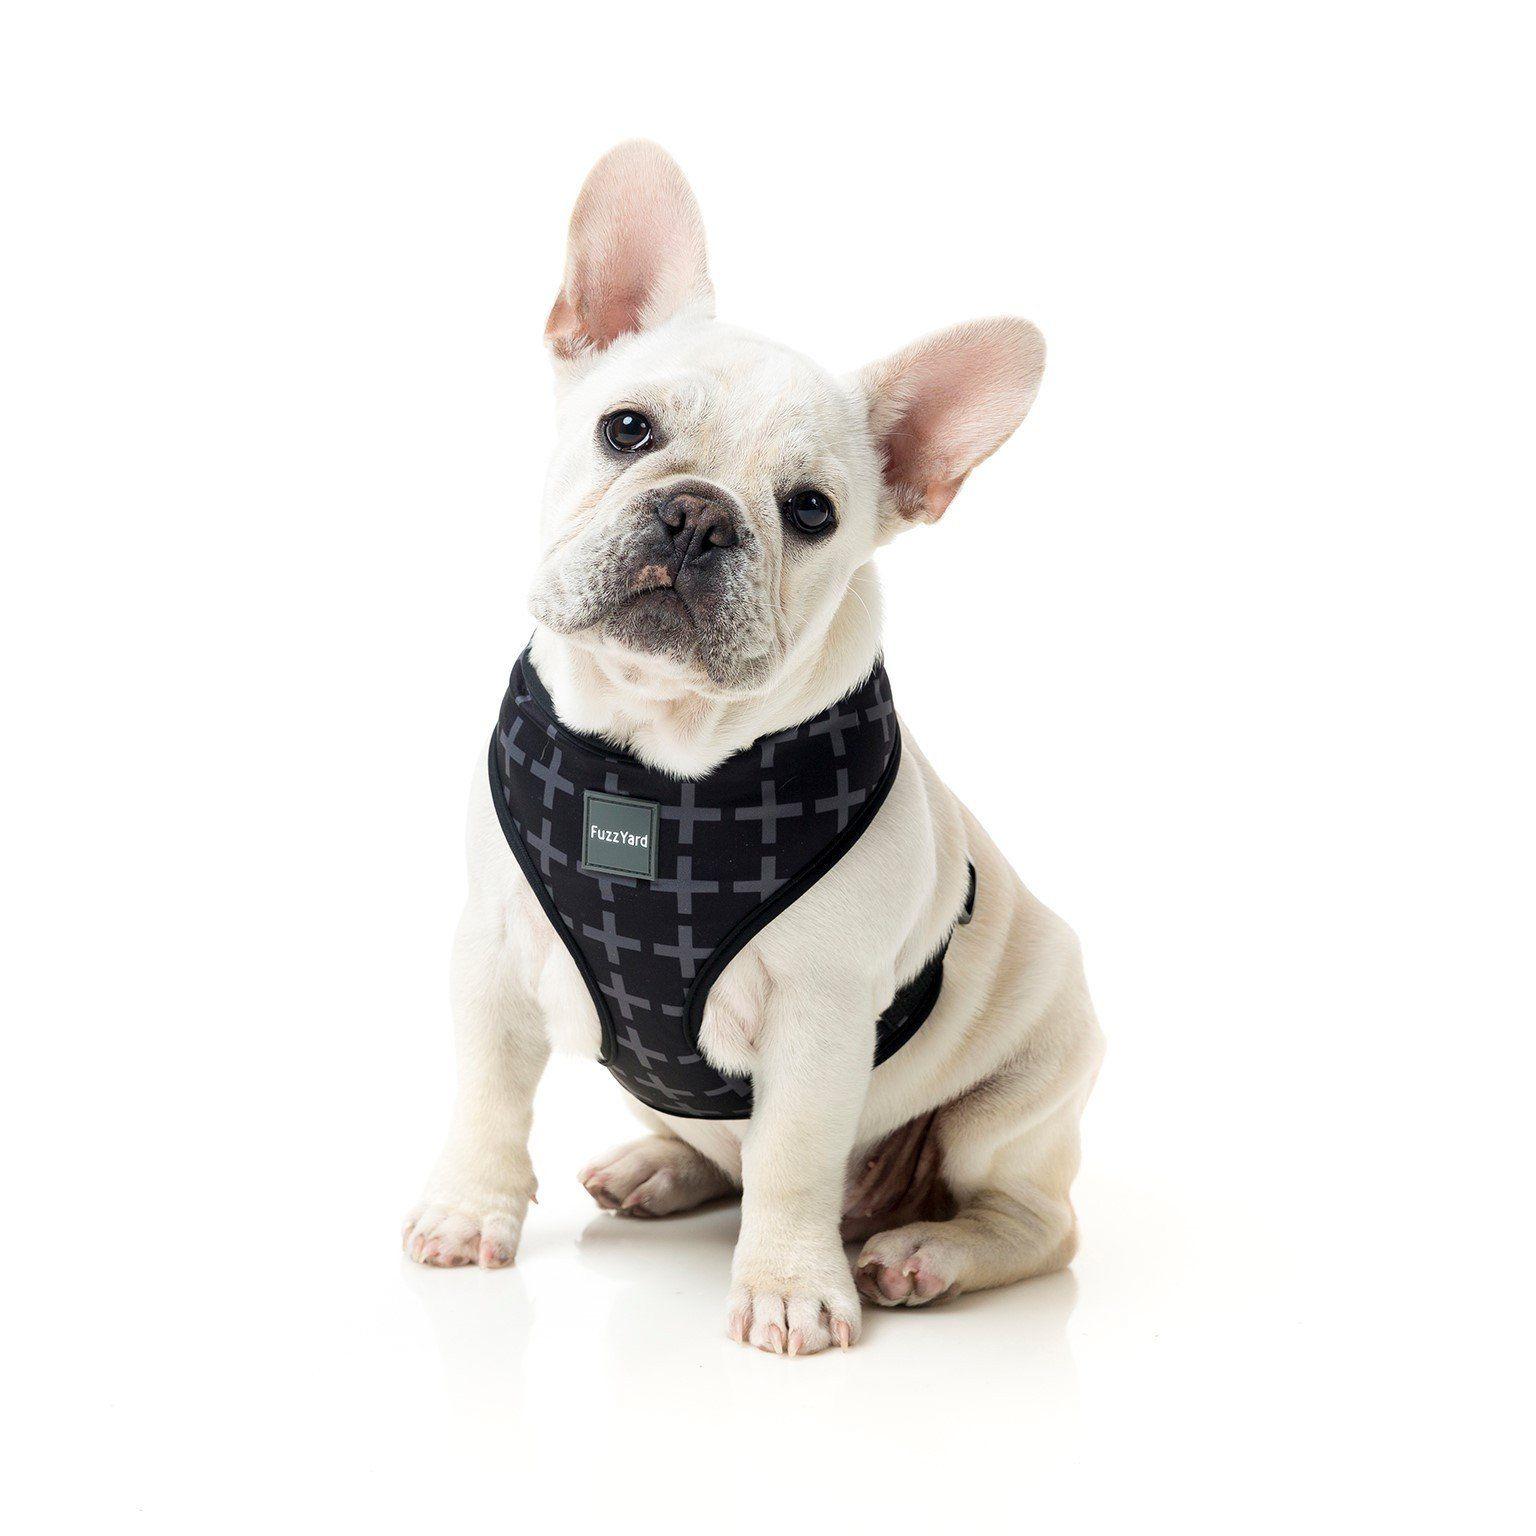 Yeezy Harness Dog Harness Dogs Pets